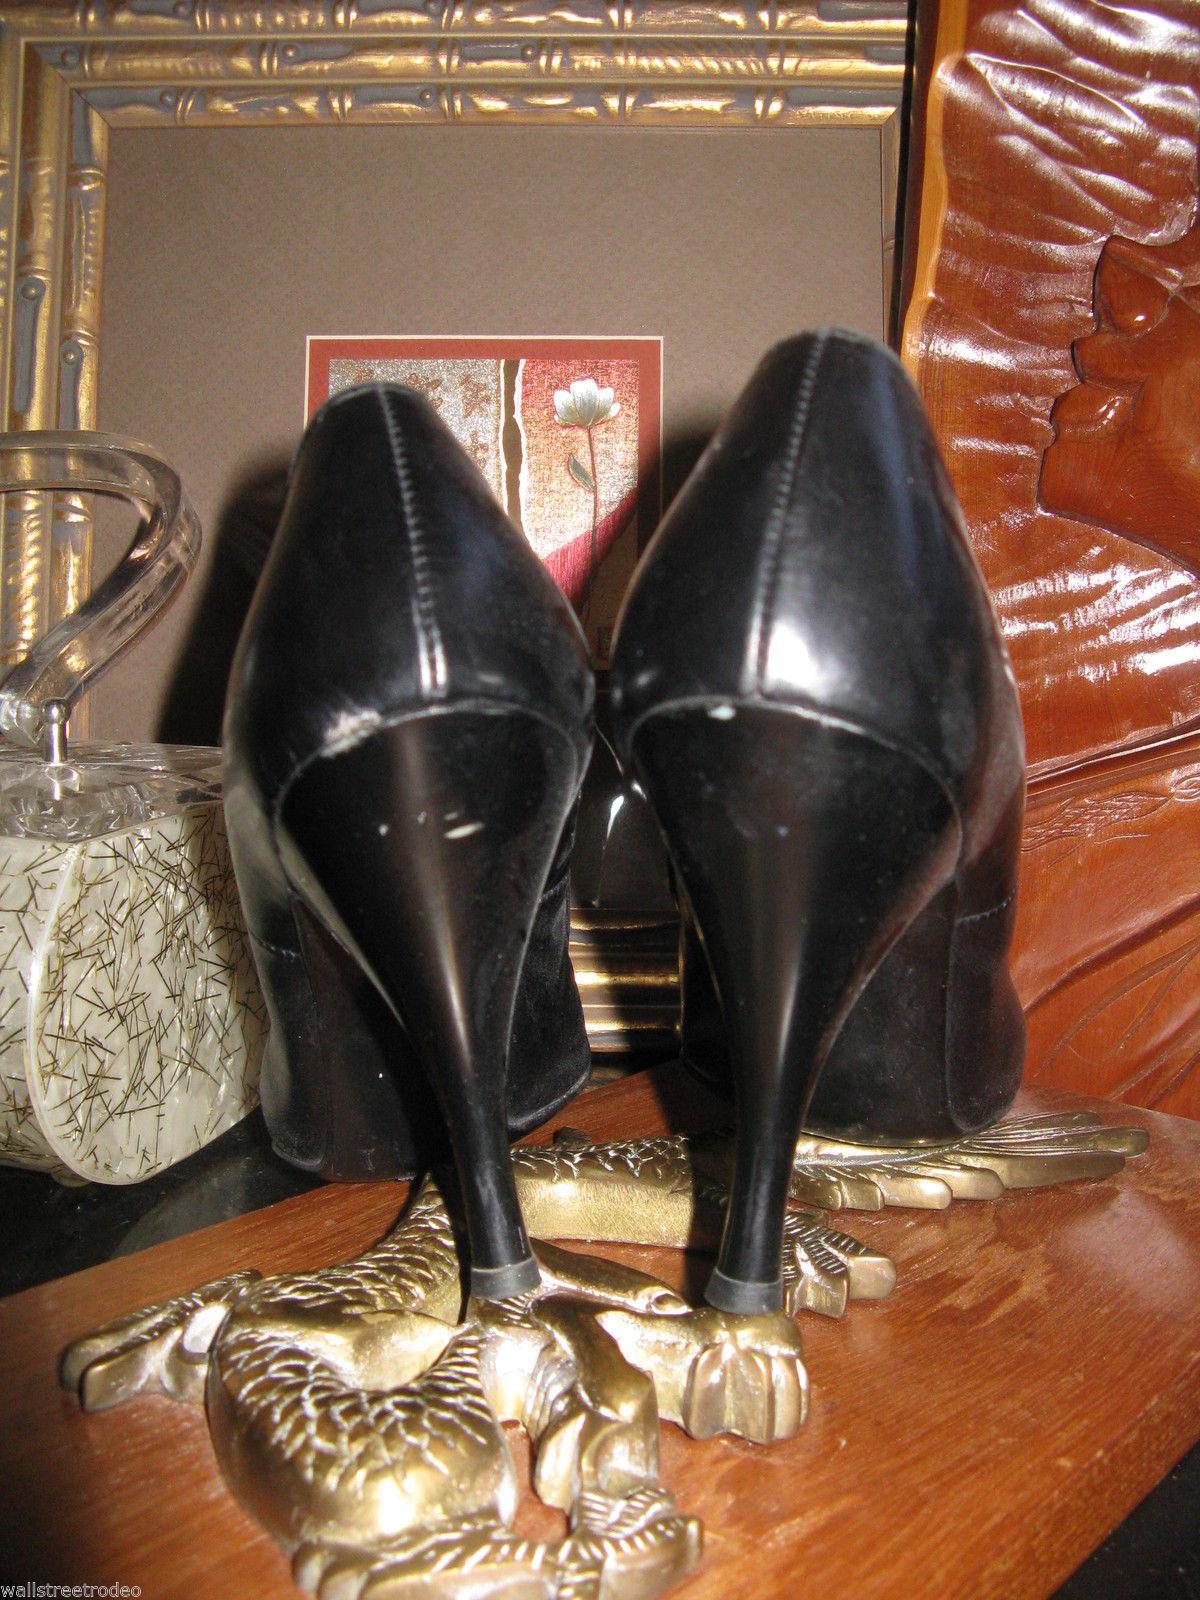 Smartaire vintage Debbie Renolds heels shoes 7 1/2 AAAA VLV 6 UK3.5 36 bonus VLV image 3